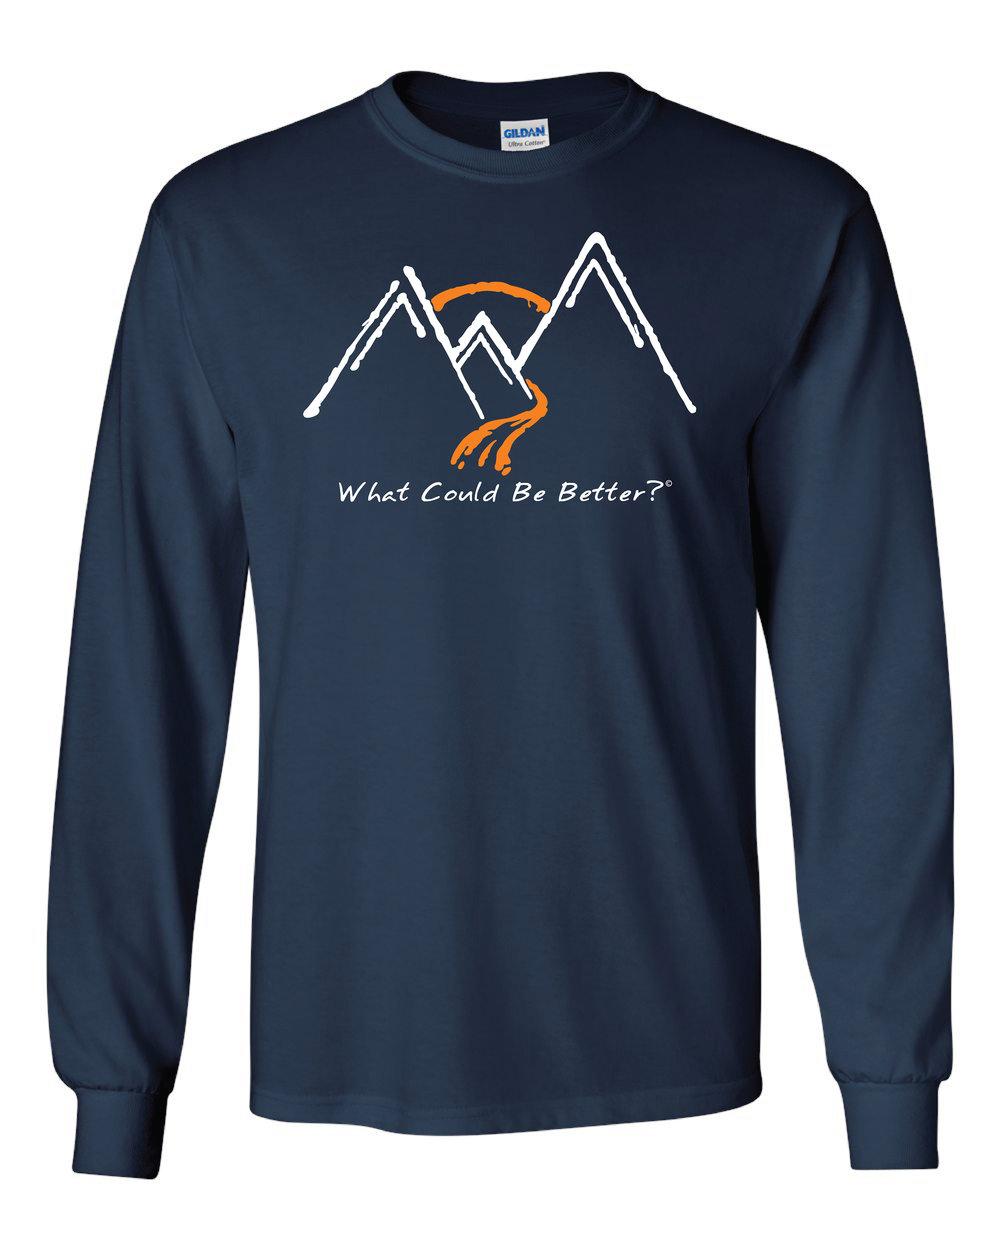 WCBB LS Navy Tshirt - Front.jpg